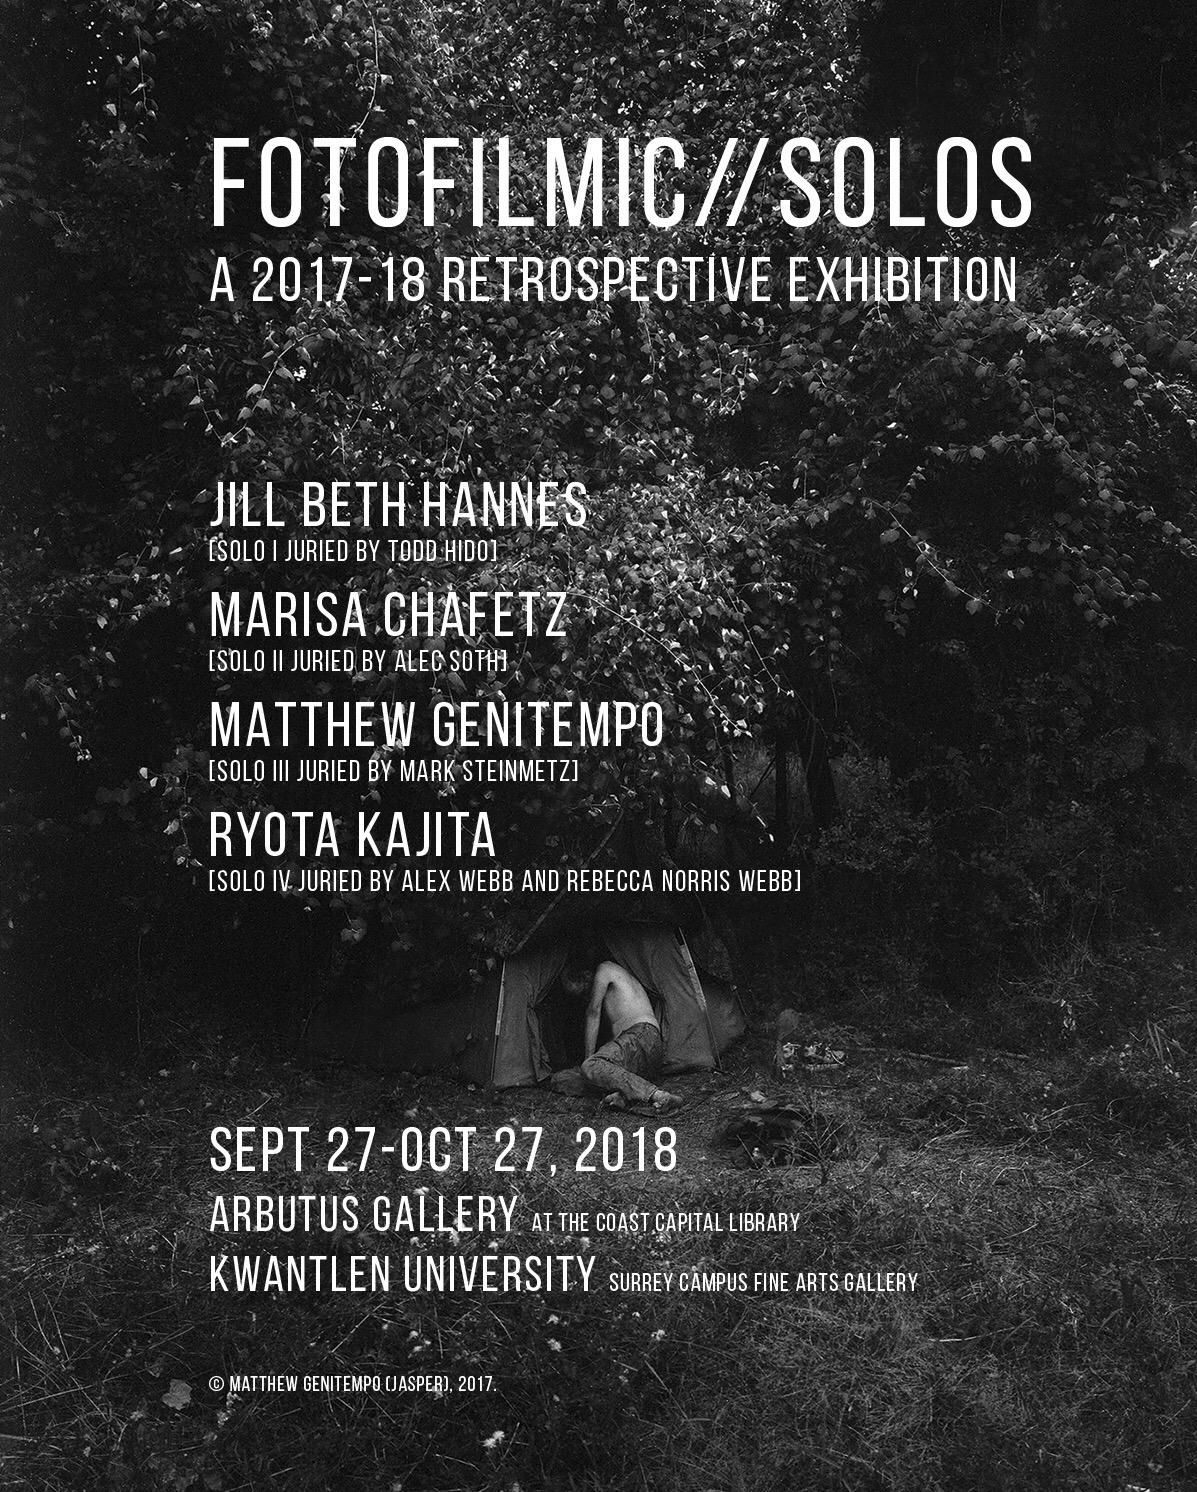 FotoFilmic_SOLOS_Web_Poster.JPG